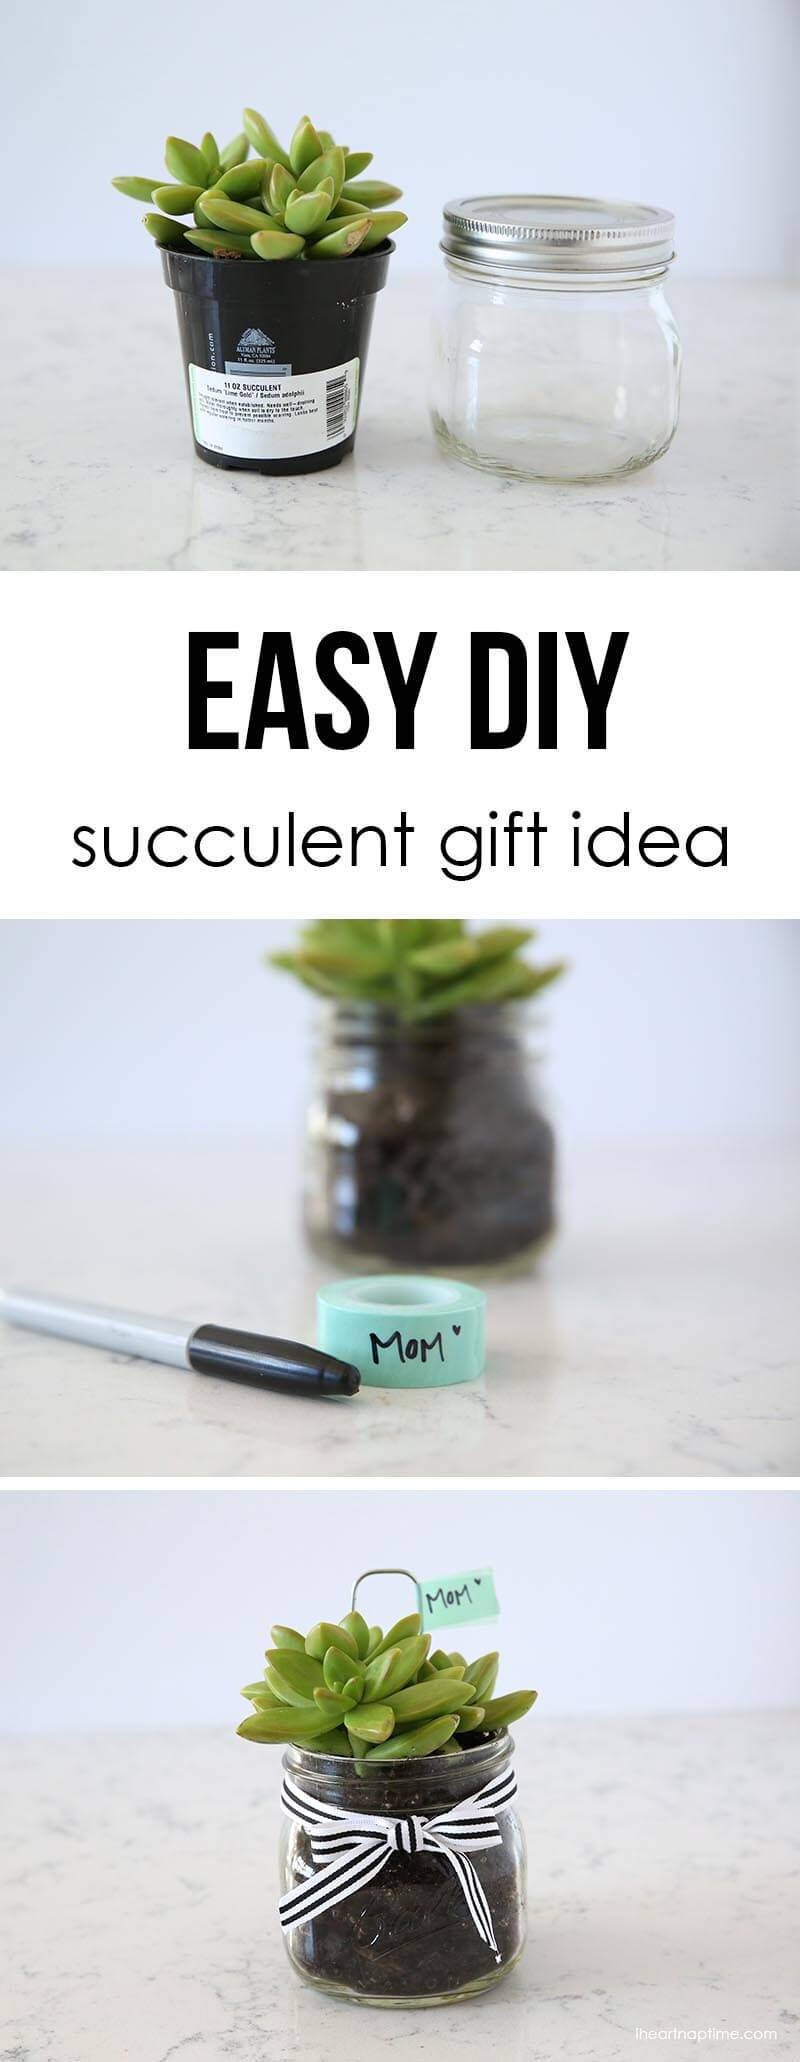 Easy DIY succlent gift idea